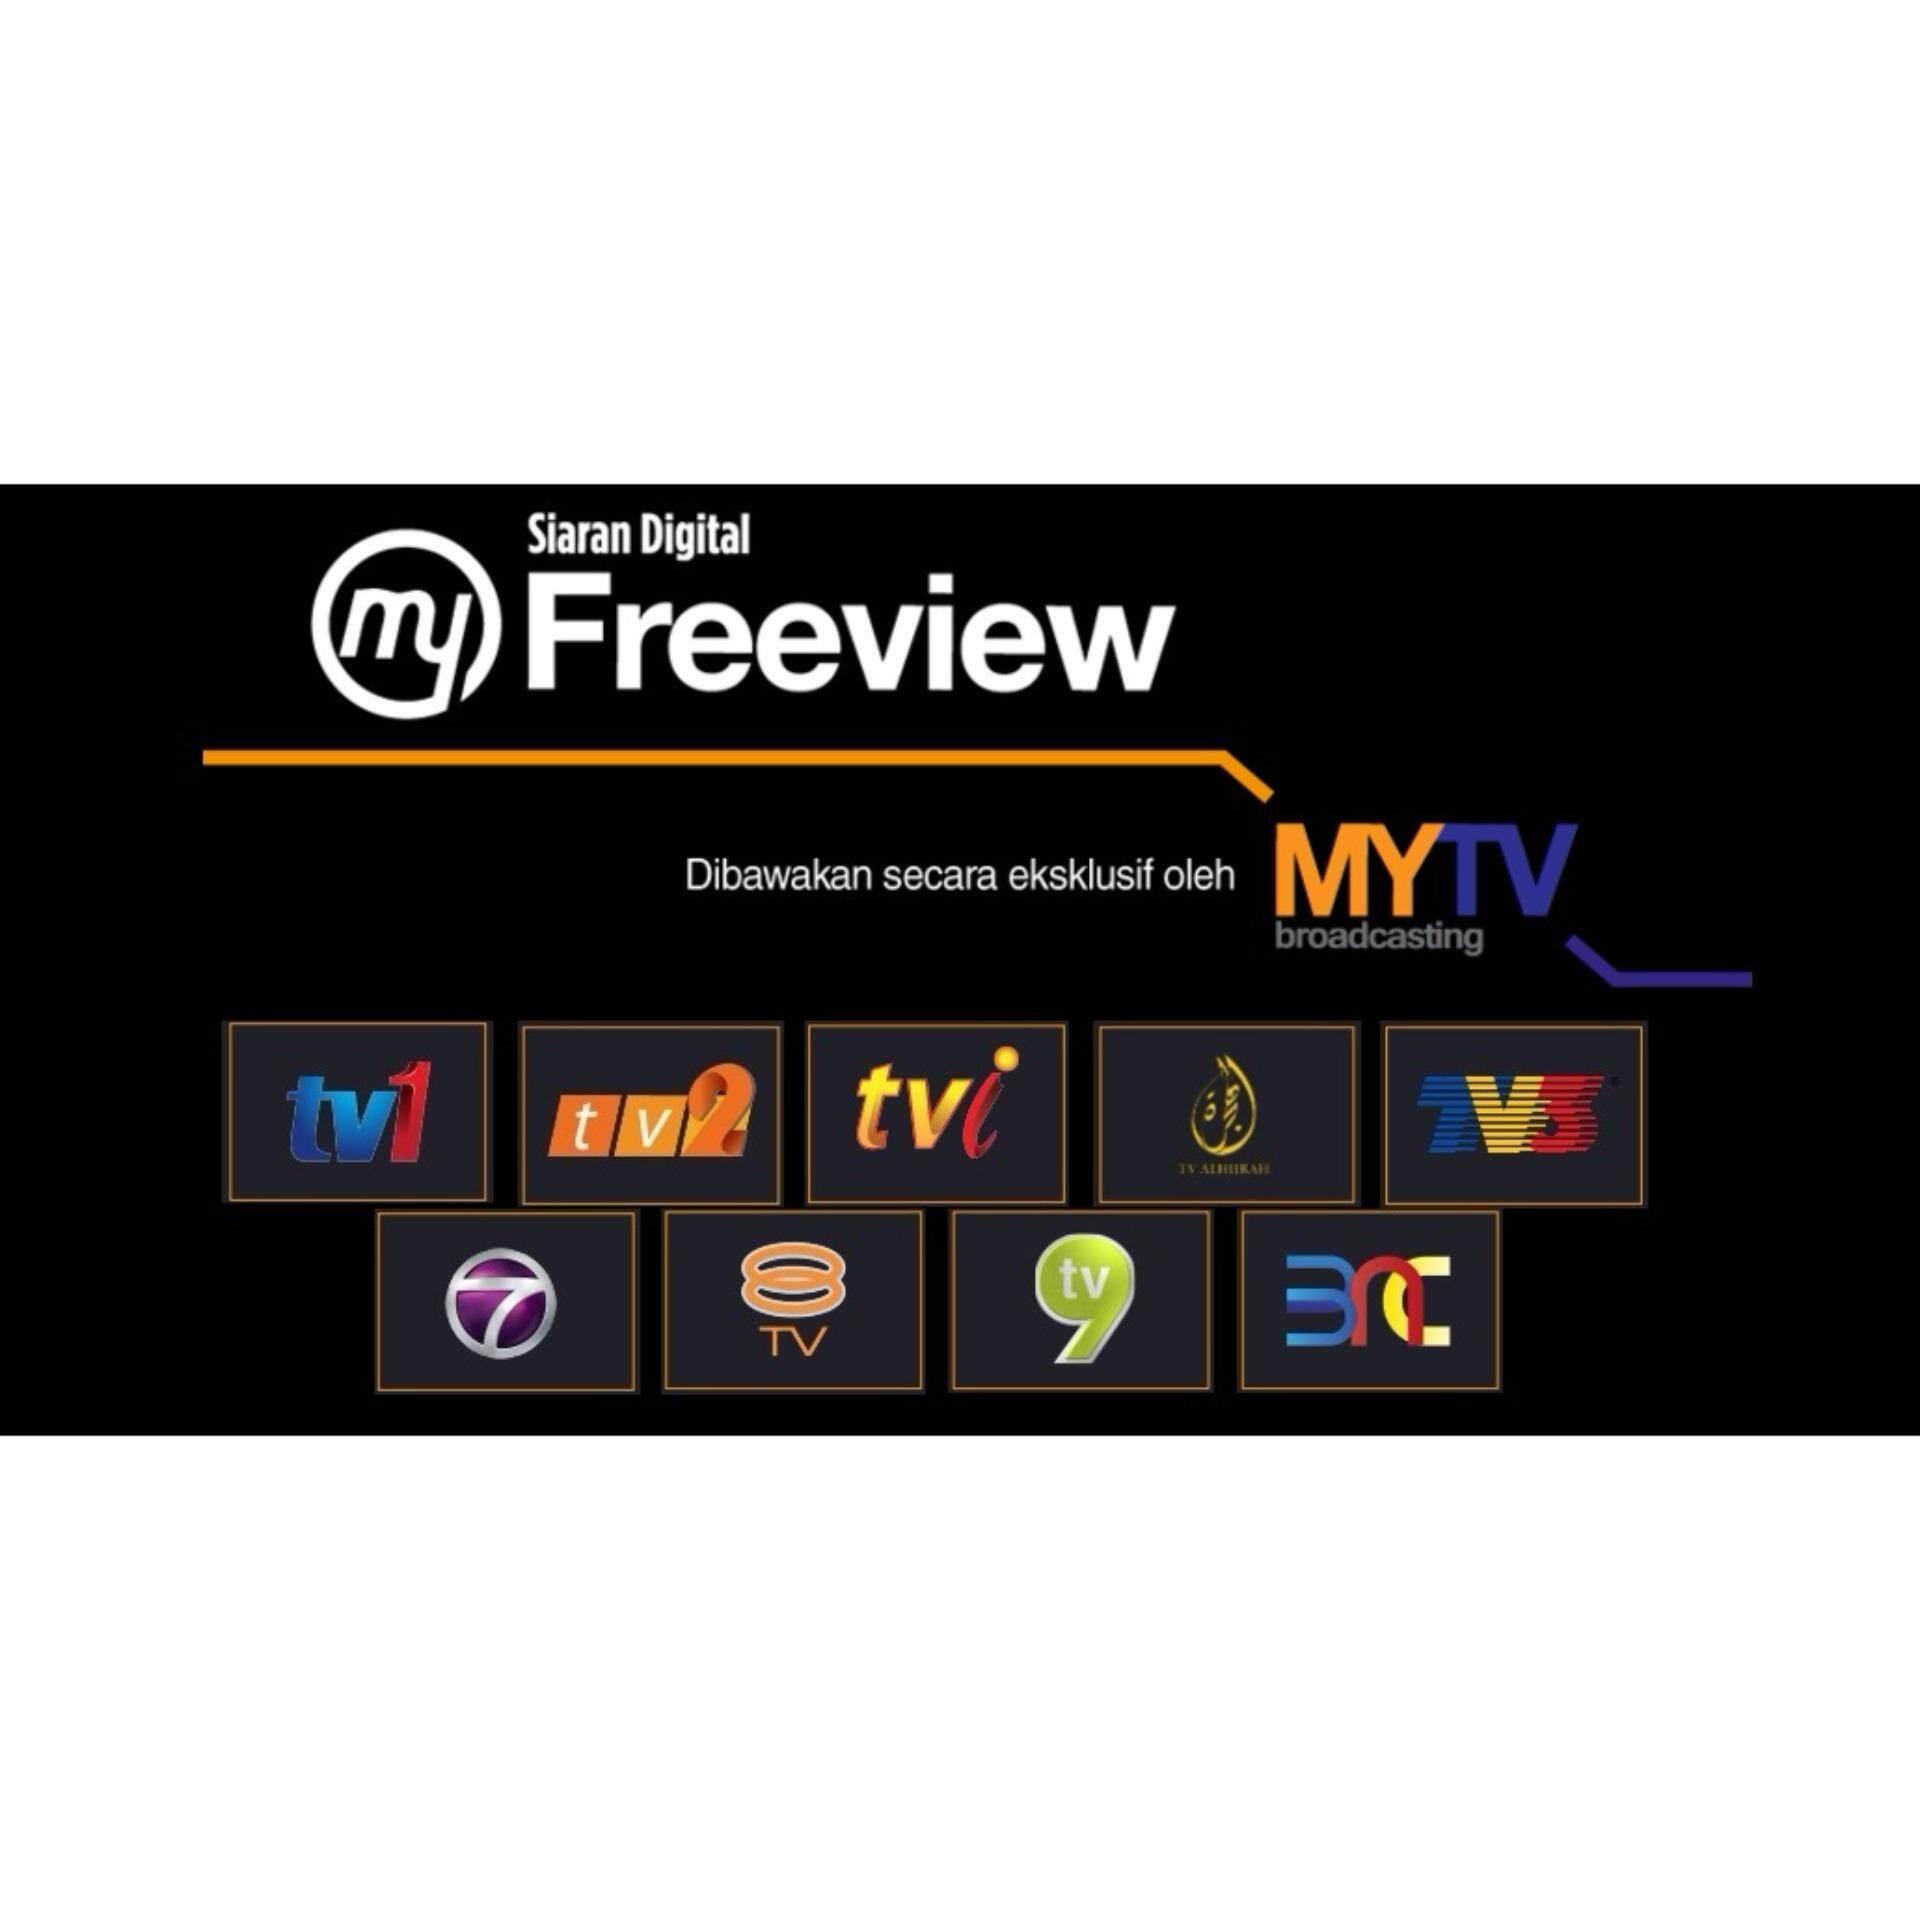 MYTV Broadcasting Advance Decoder IR 9410